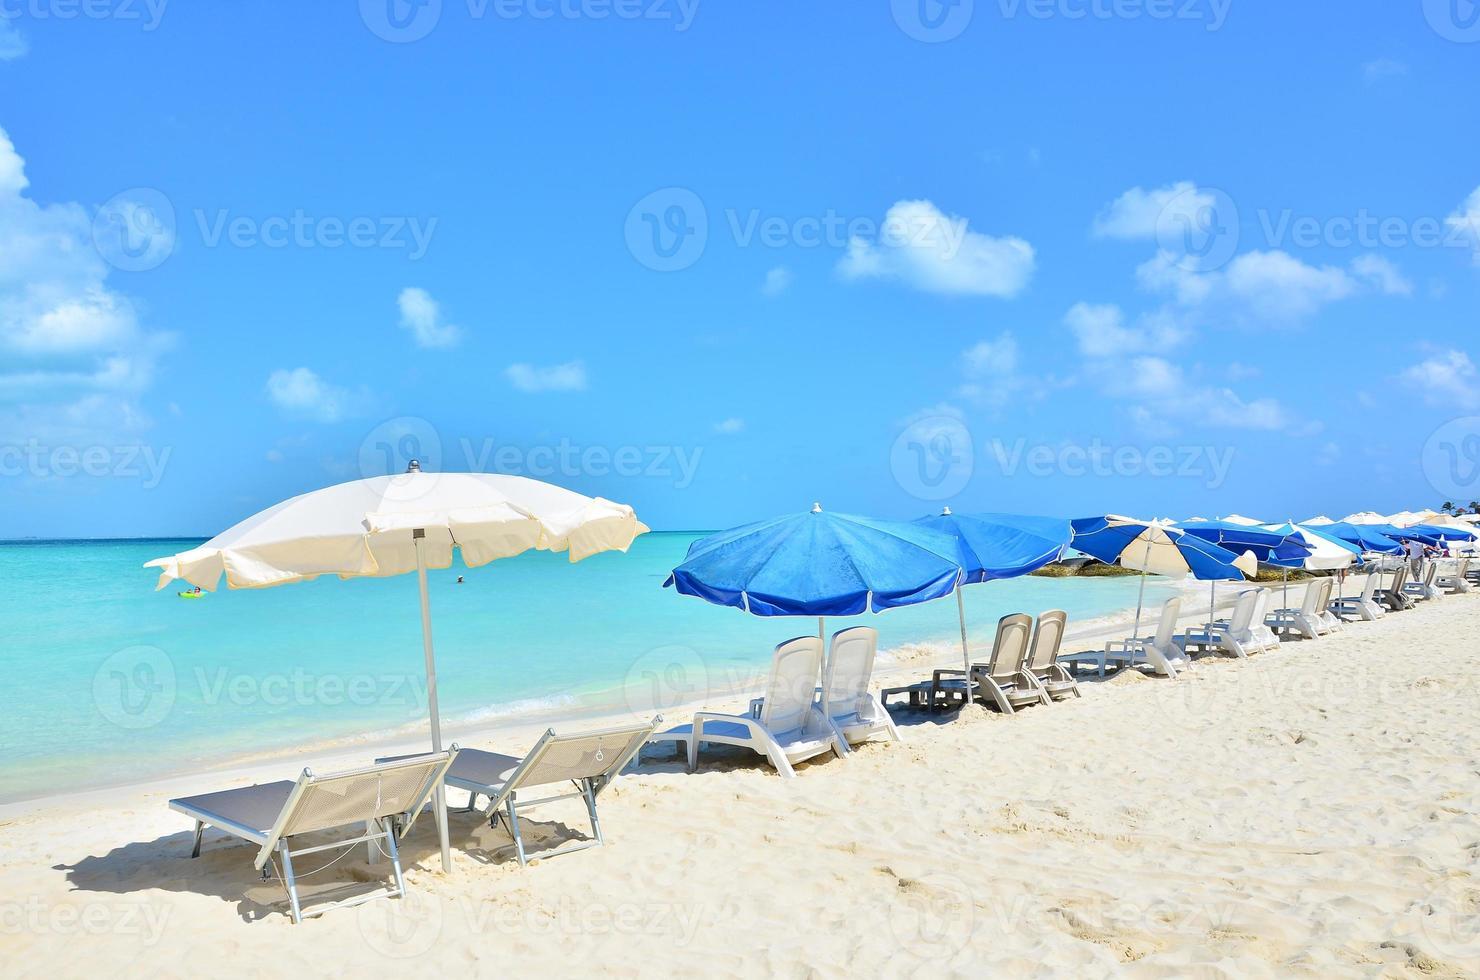 Karibikstrand foto